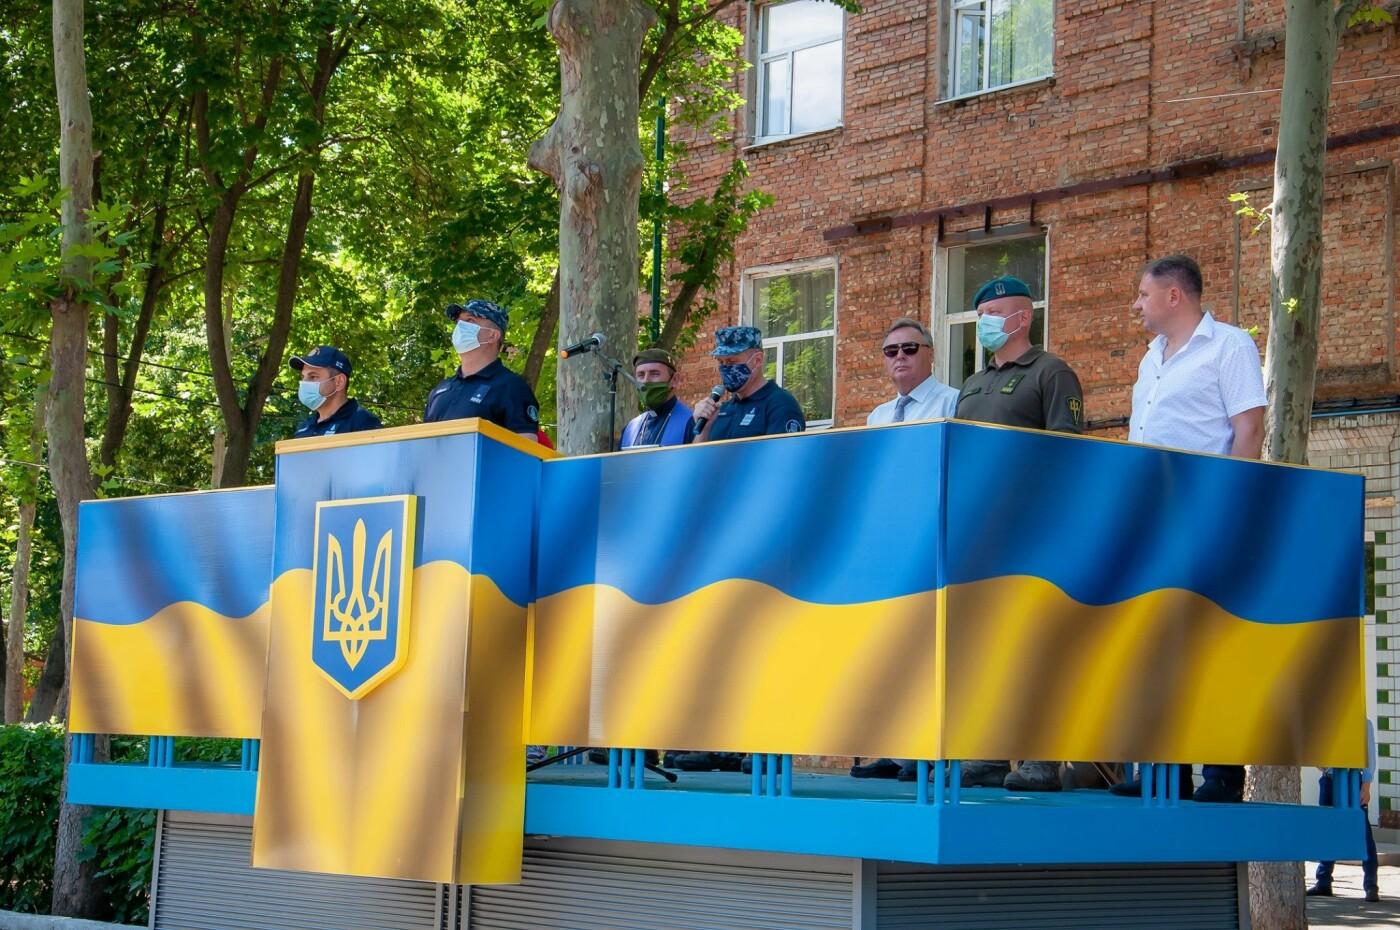 В Николаеве открыли школу морского пехотинца на базе учебного центра ВМФ, фото-5